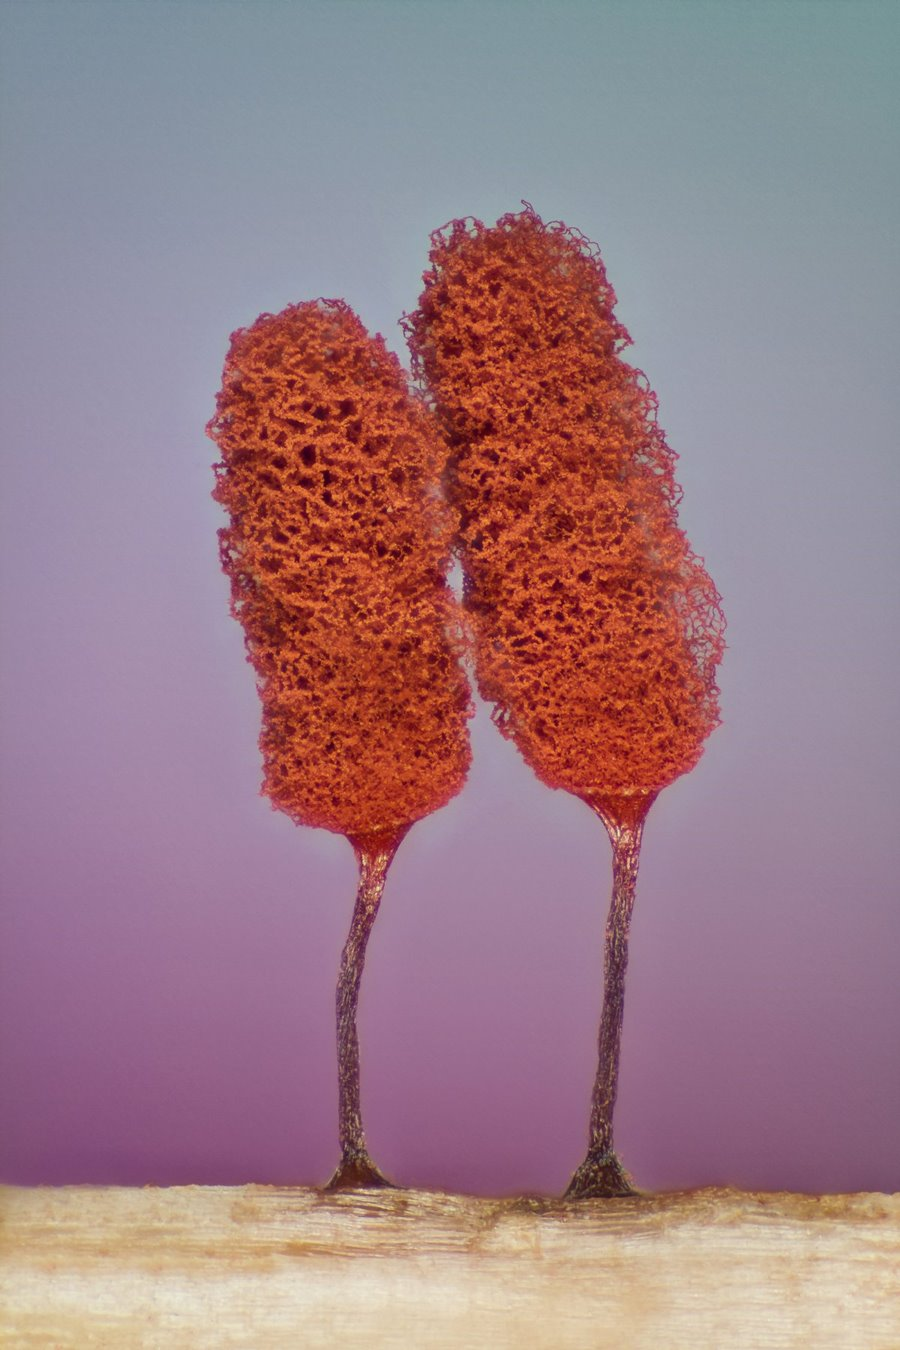 mikroskopicke-zabery-2